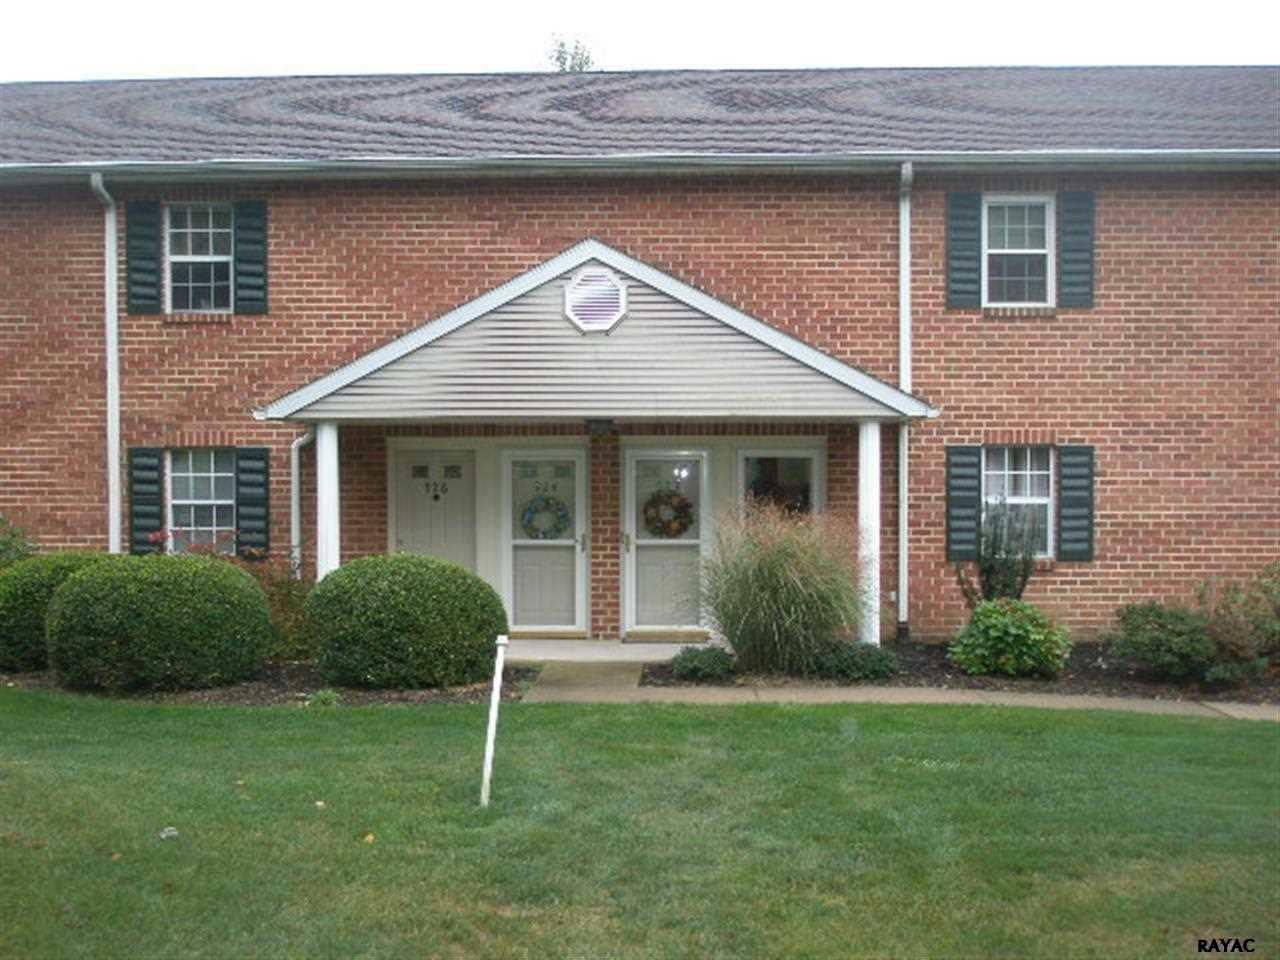 922 Eagle Ln, Wrightsville, PA 17368